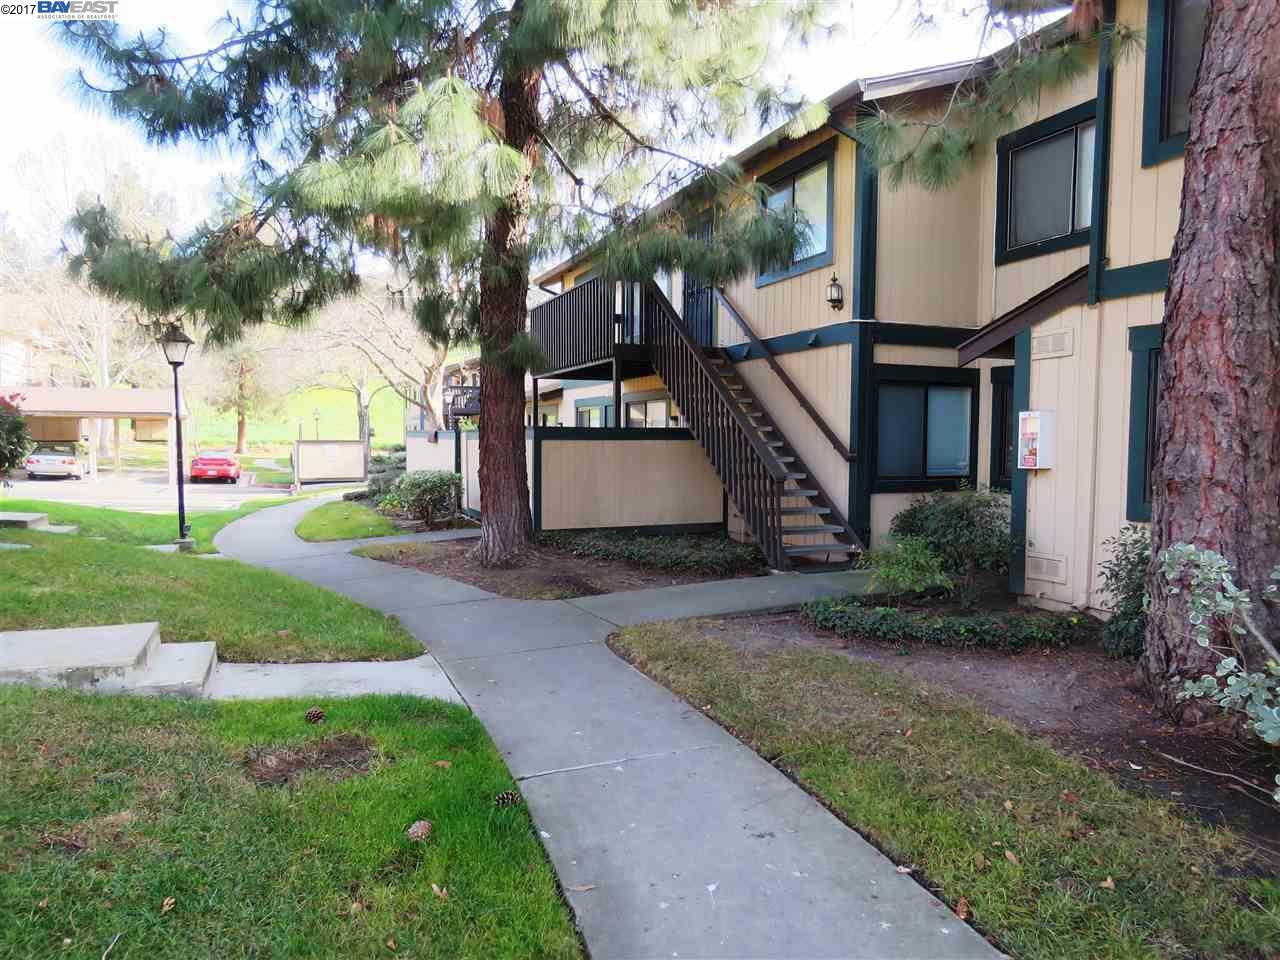 Condominio por un Alquiler en 214 Famoso Plz 214 Famoso Plz Union City, California 94587 Estados Unidos